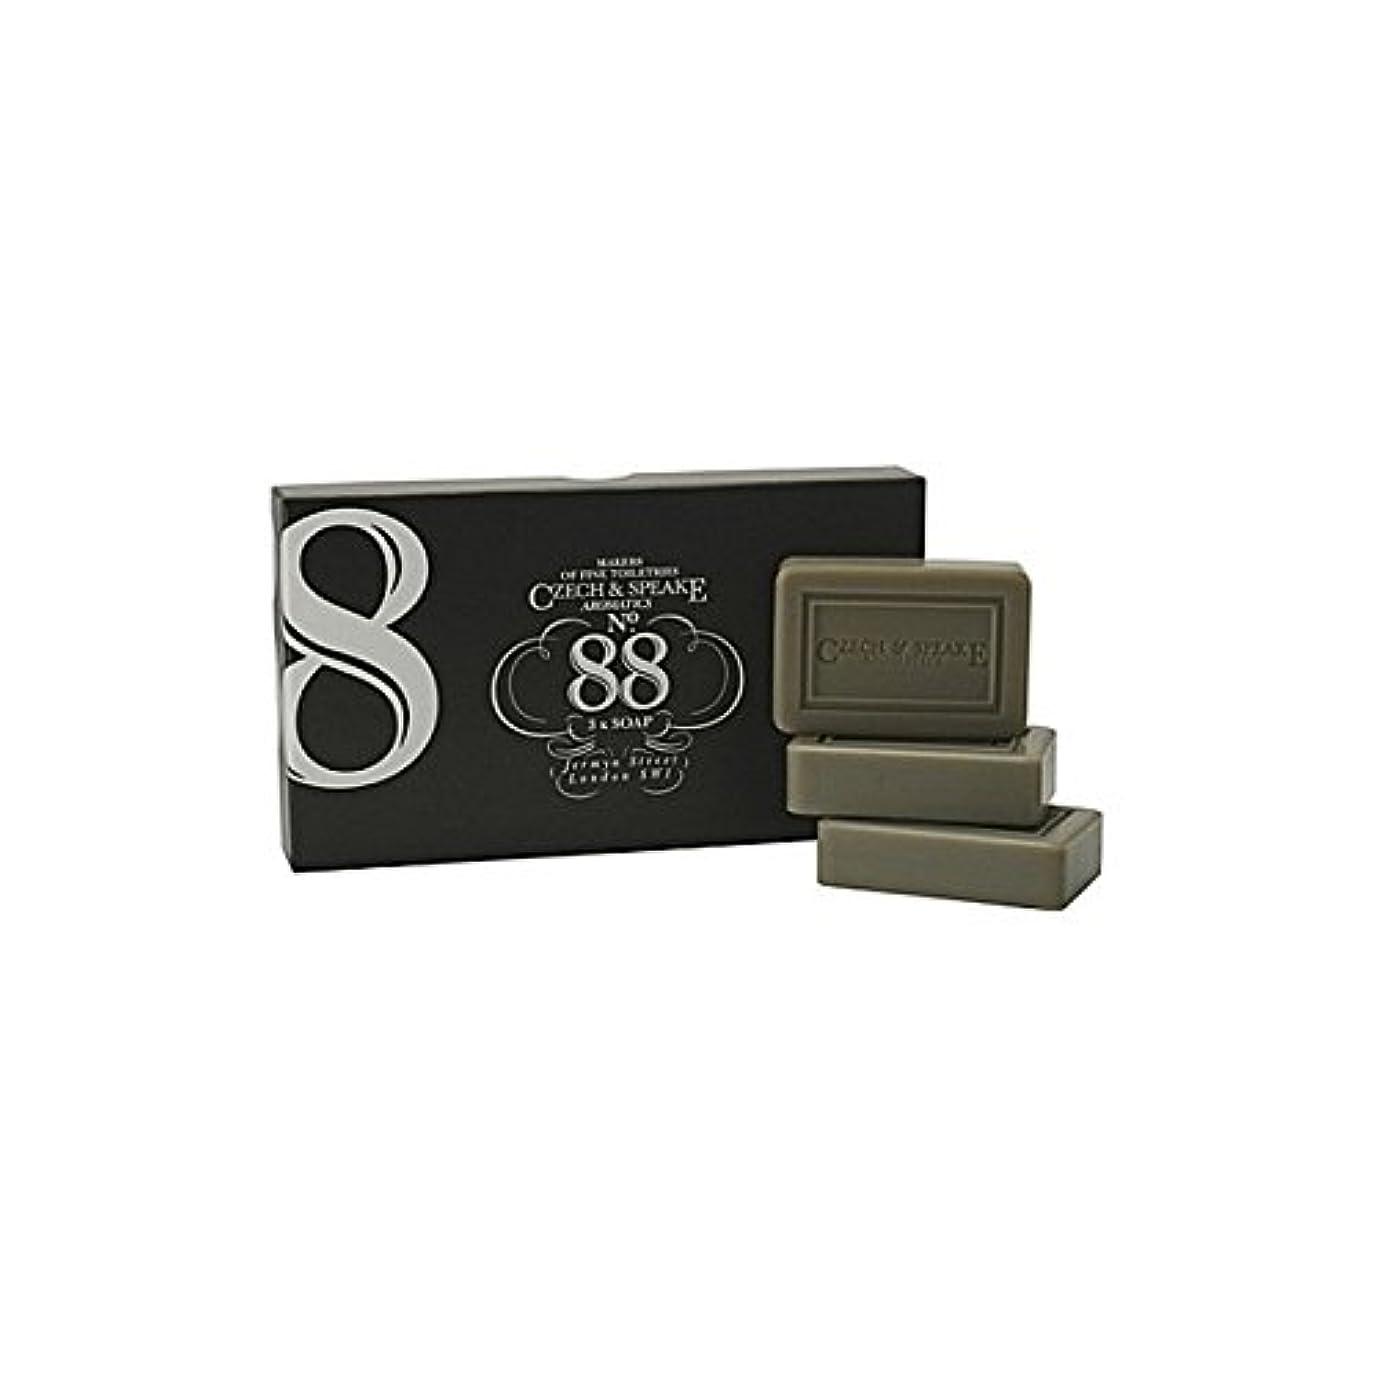 Czech & Speake No.88 Soap Set - チェコ&スピーク.88ソープセット [並行輸入品]